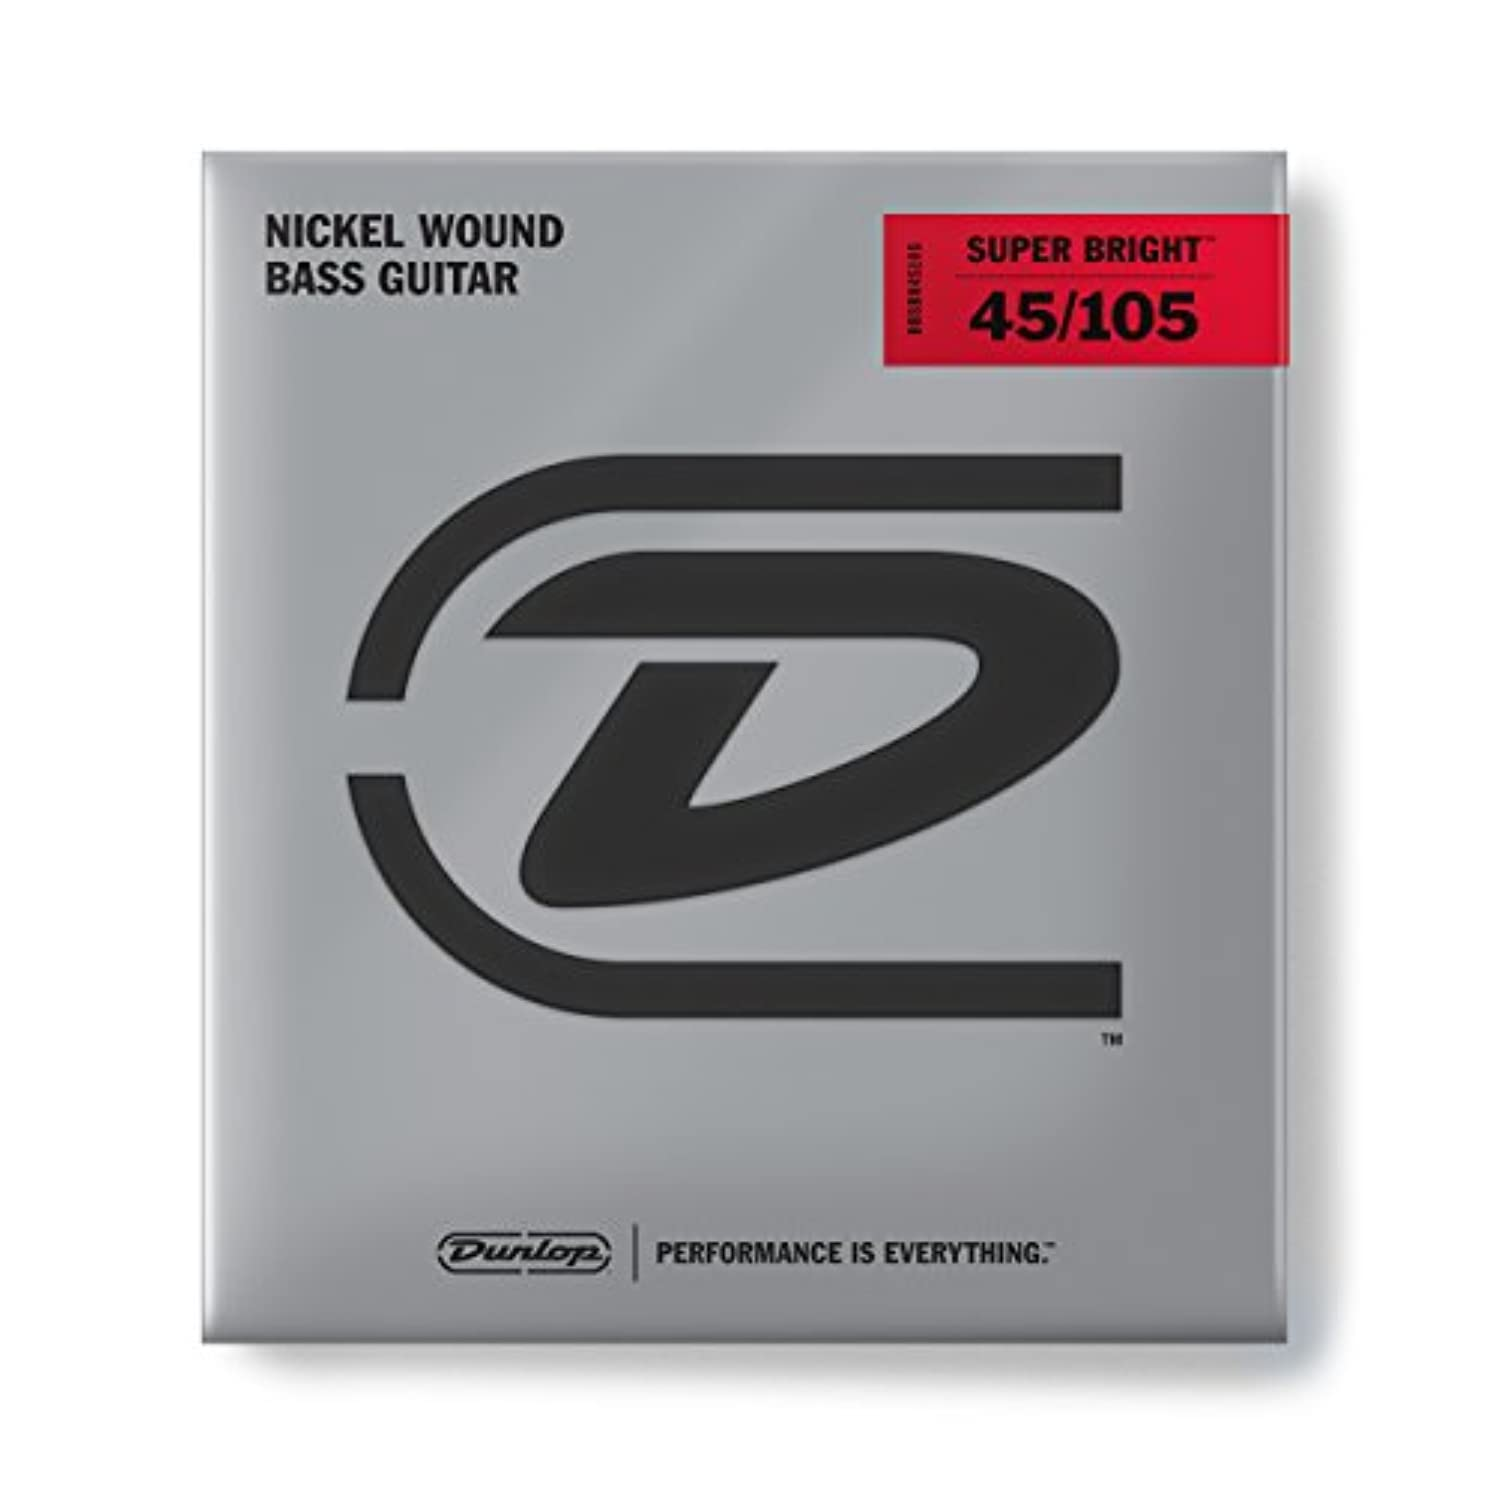 Dunlop DBSBN45105 Super Bright Bass Strings, Nickel Wound, Medium, .045–.105, 4 Strings/Set